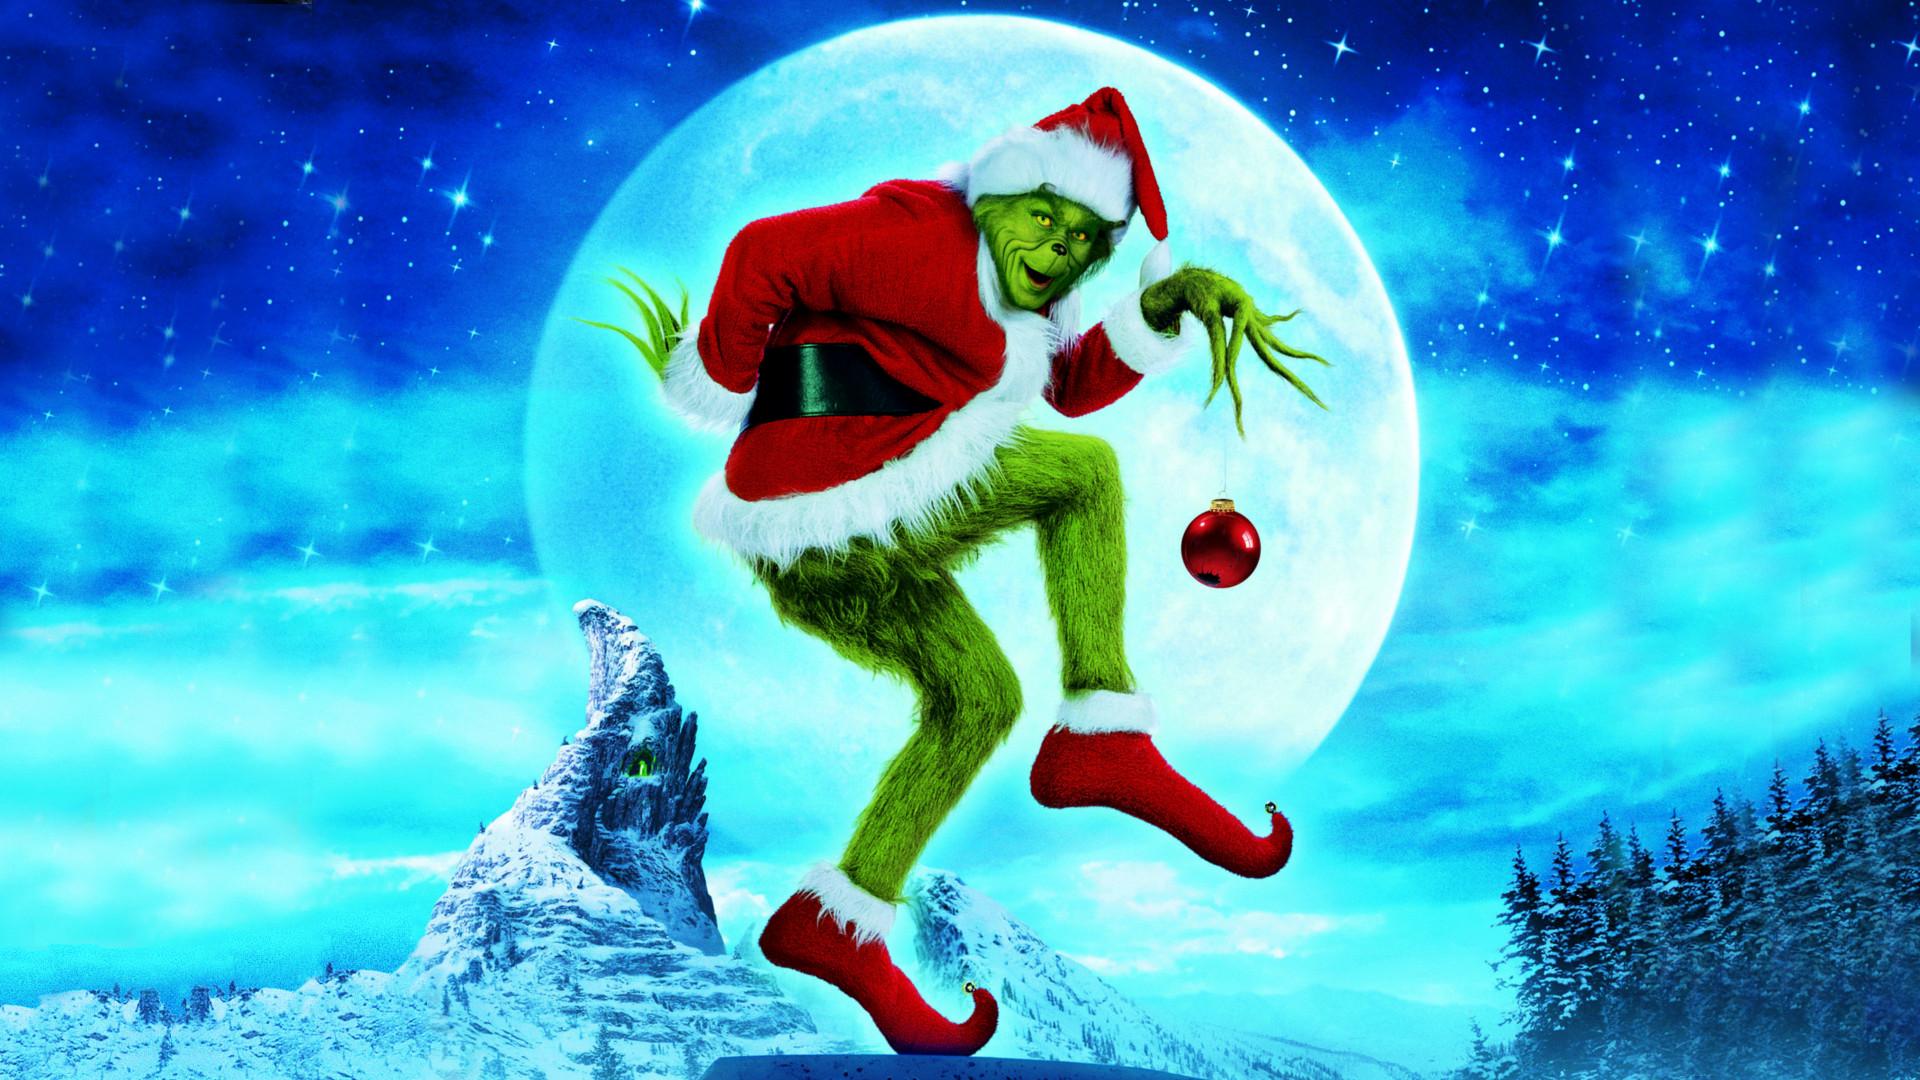 How the Grinch Stole Christmas | Movie fanart | fanart.tv